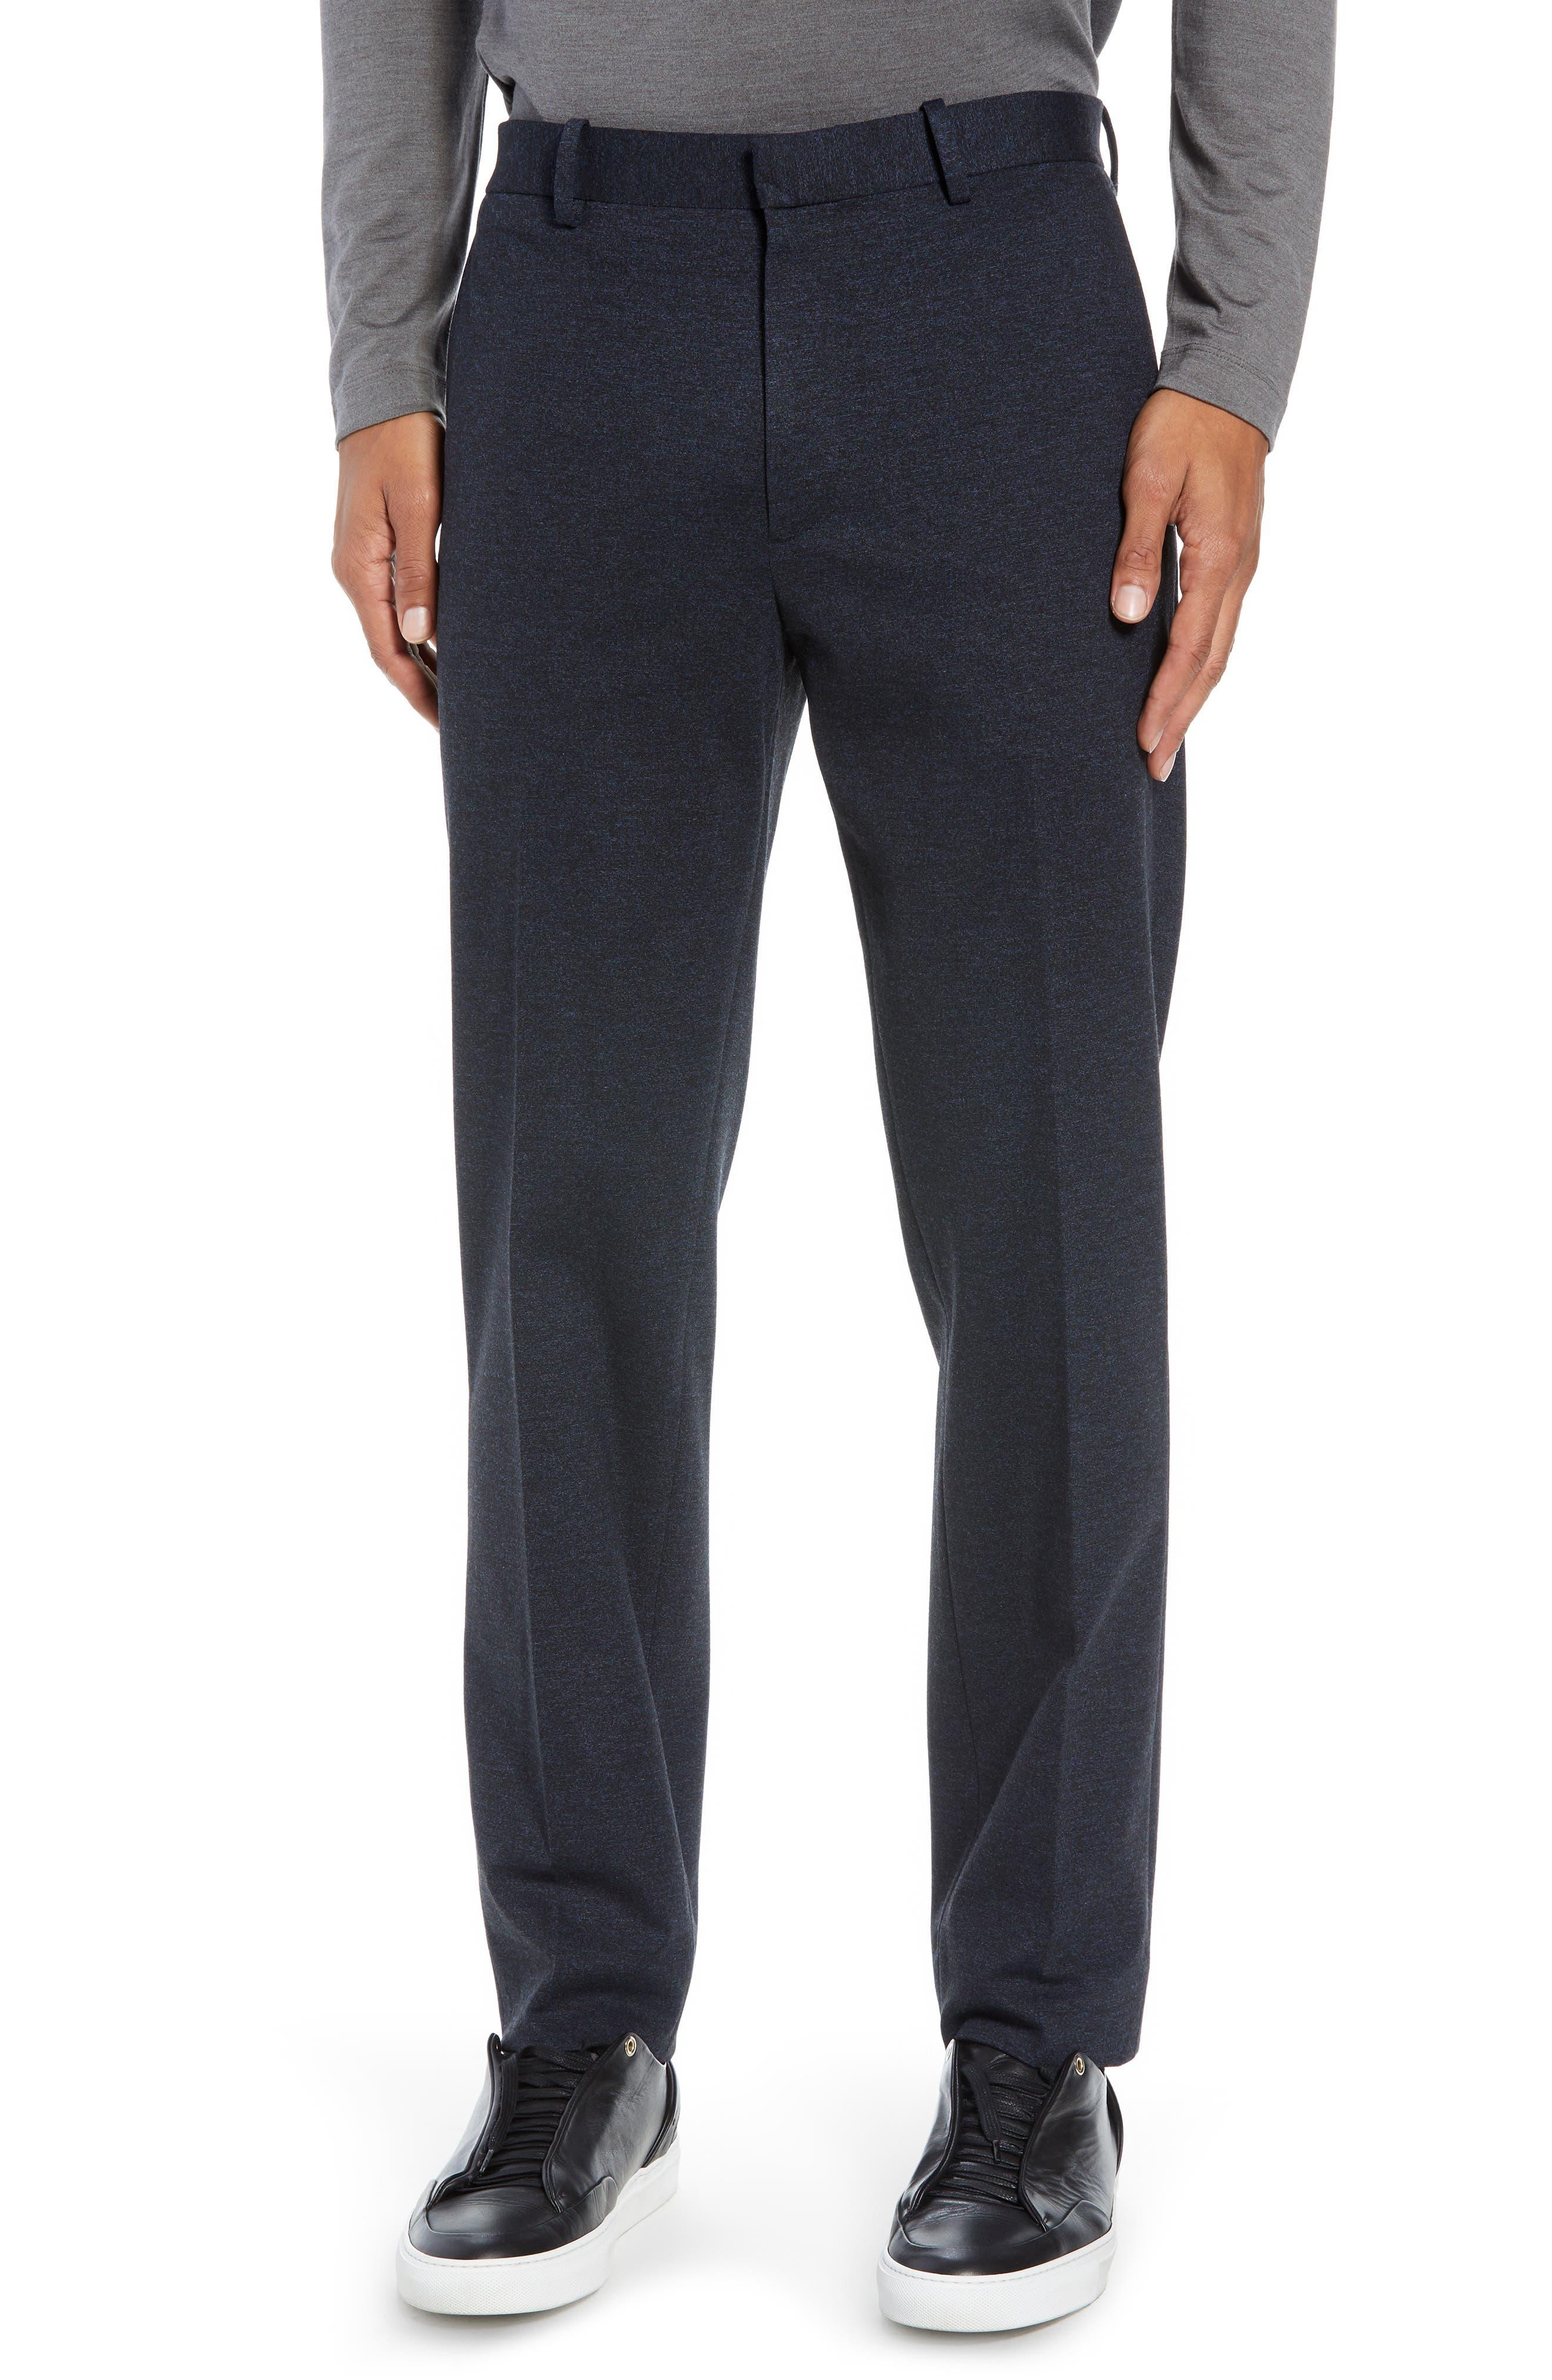 Payton Marled Ponte Trousers,                             Main thumbnail 1, color,                             ECLIPSE MELANGE